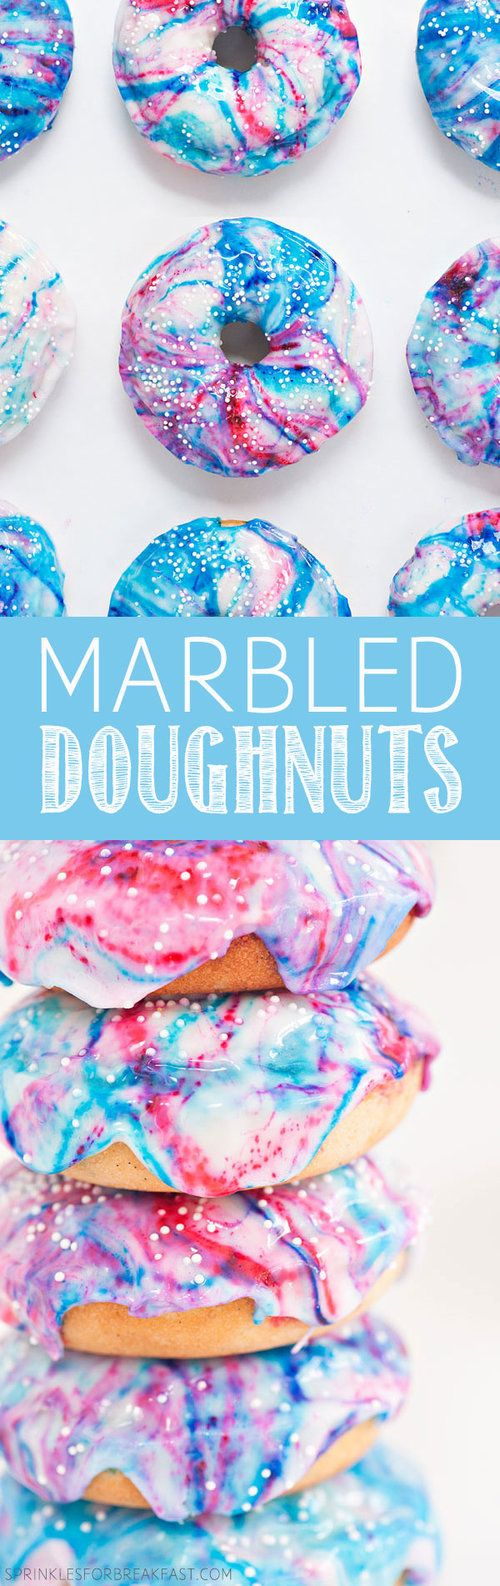 Marbled Doughnuts | Sprinkles for Breakfast